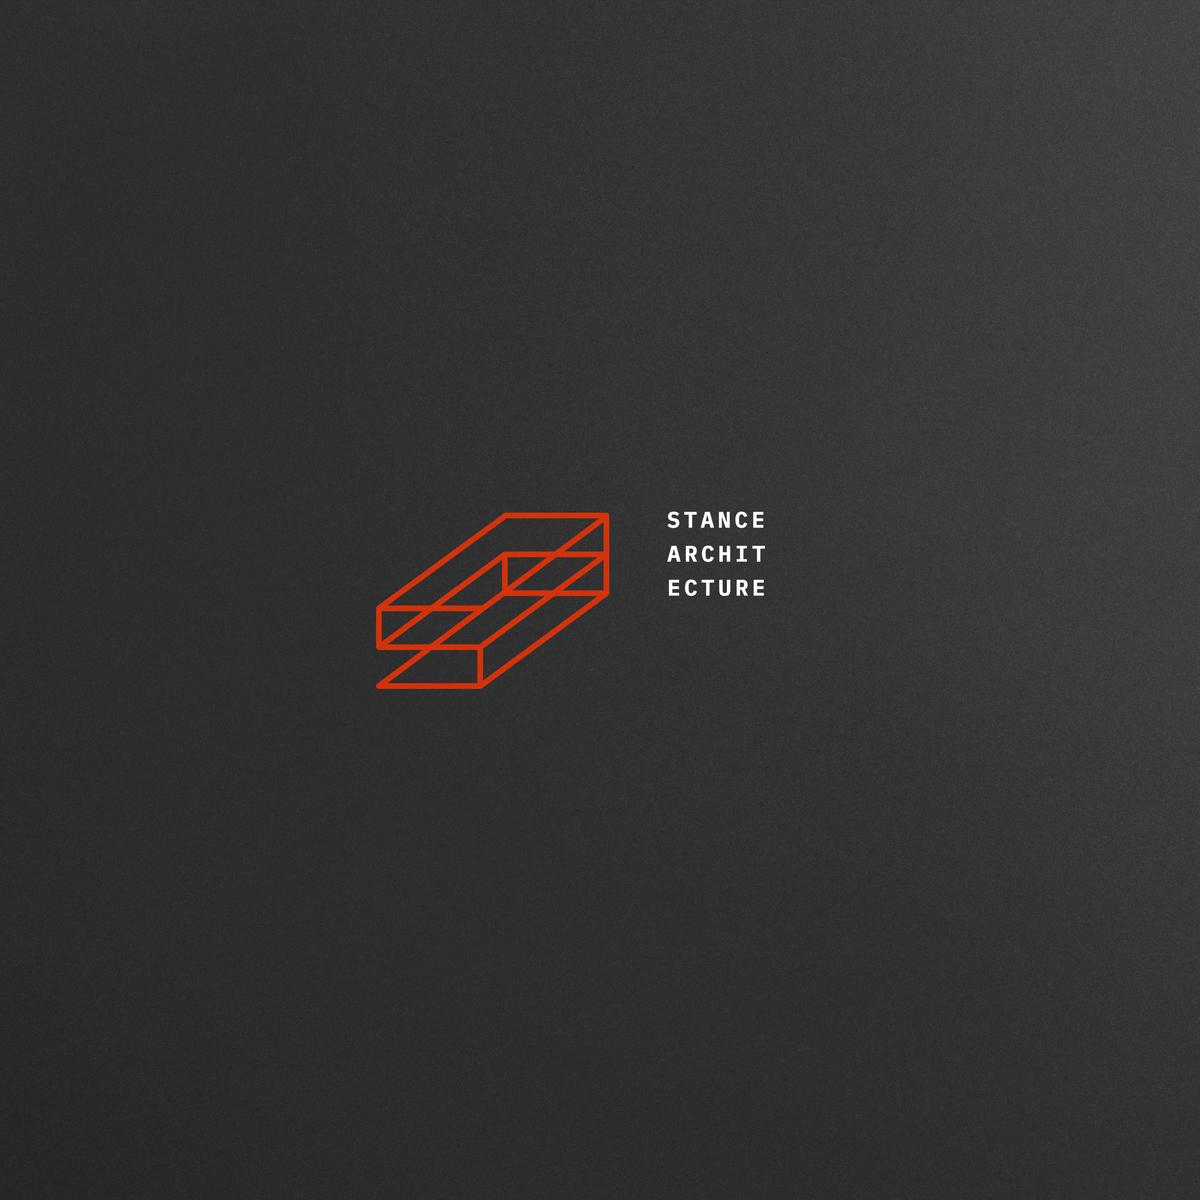 architecture firm branding, Stance logo lockup